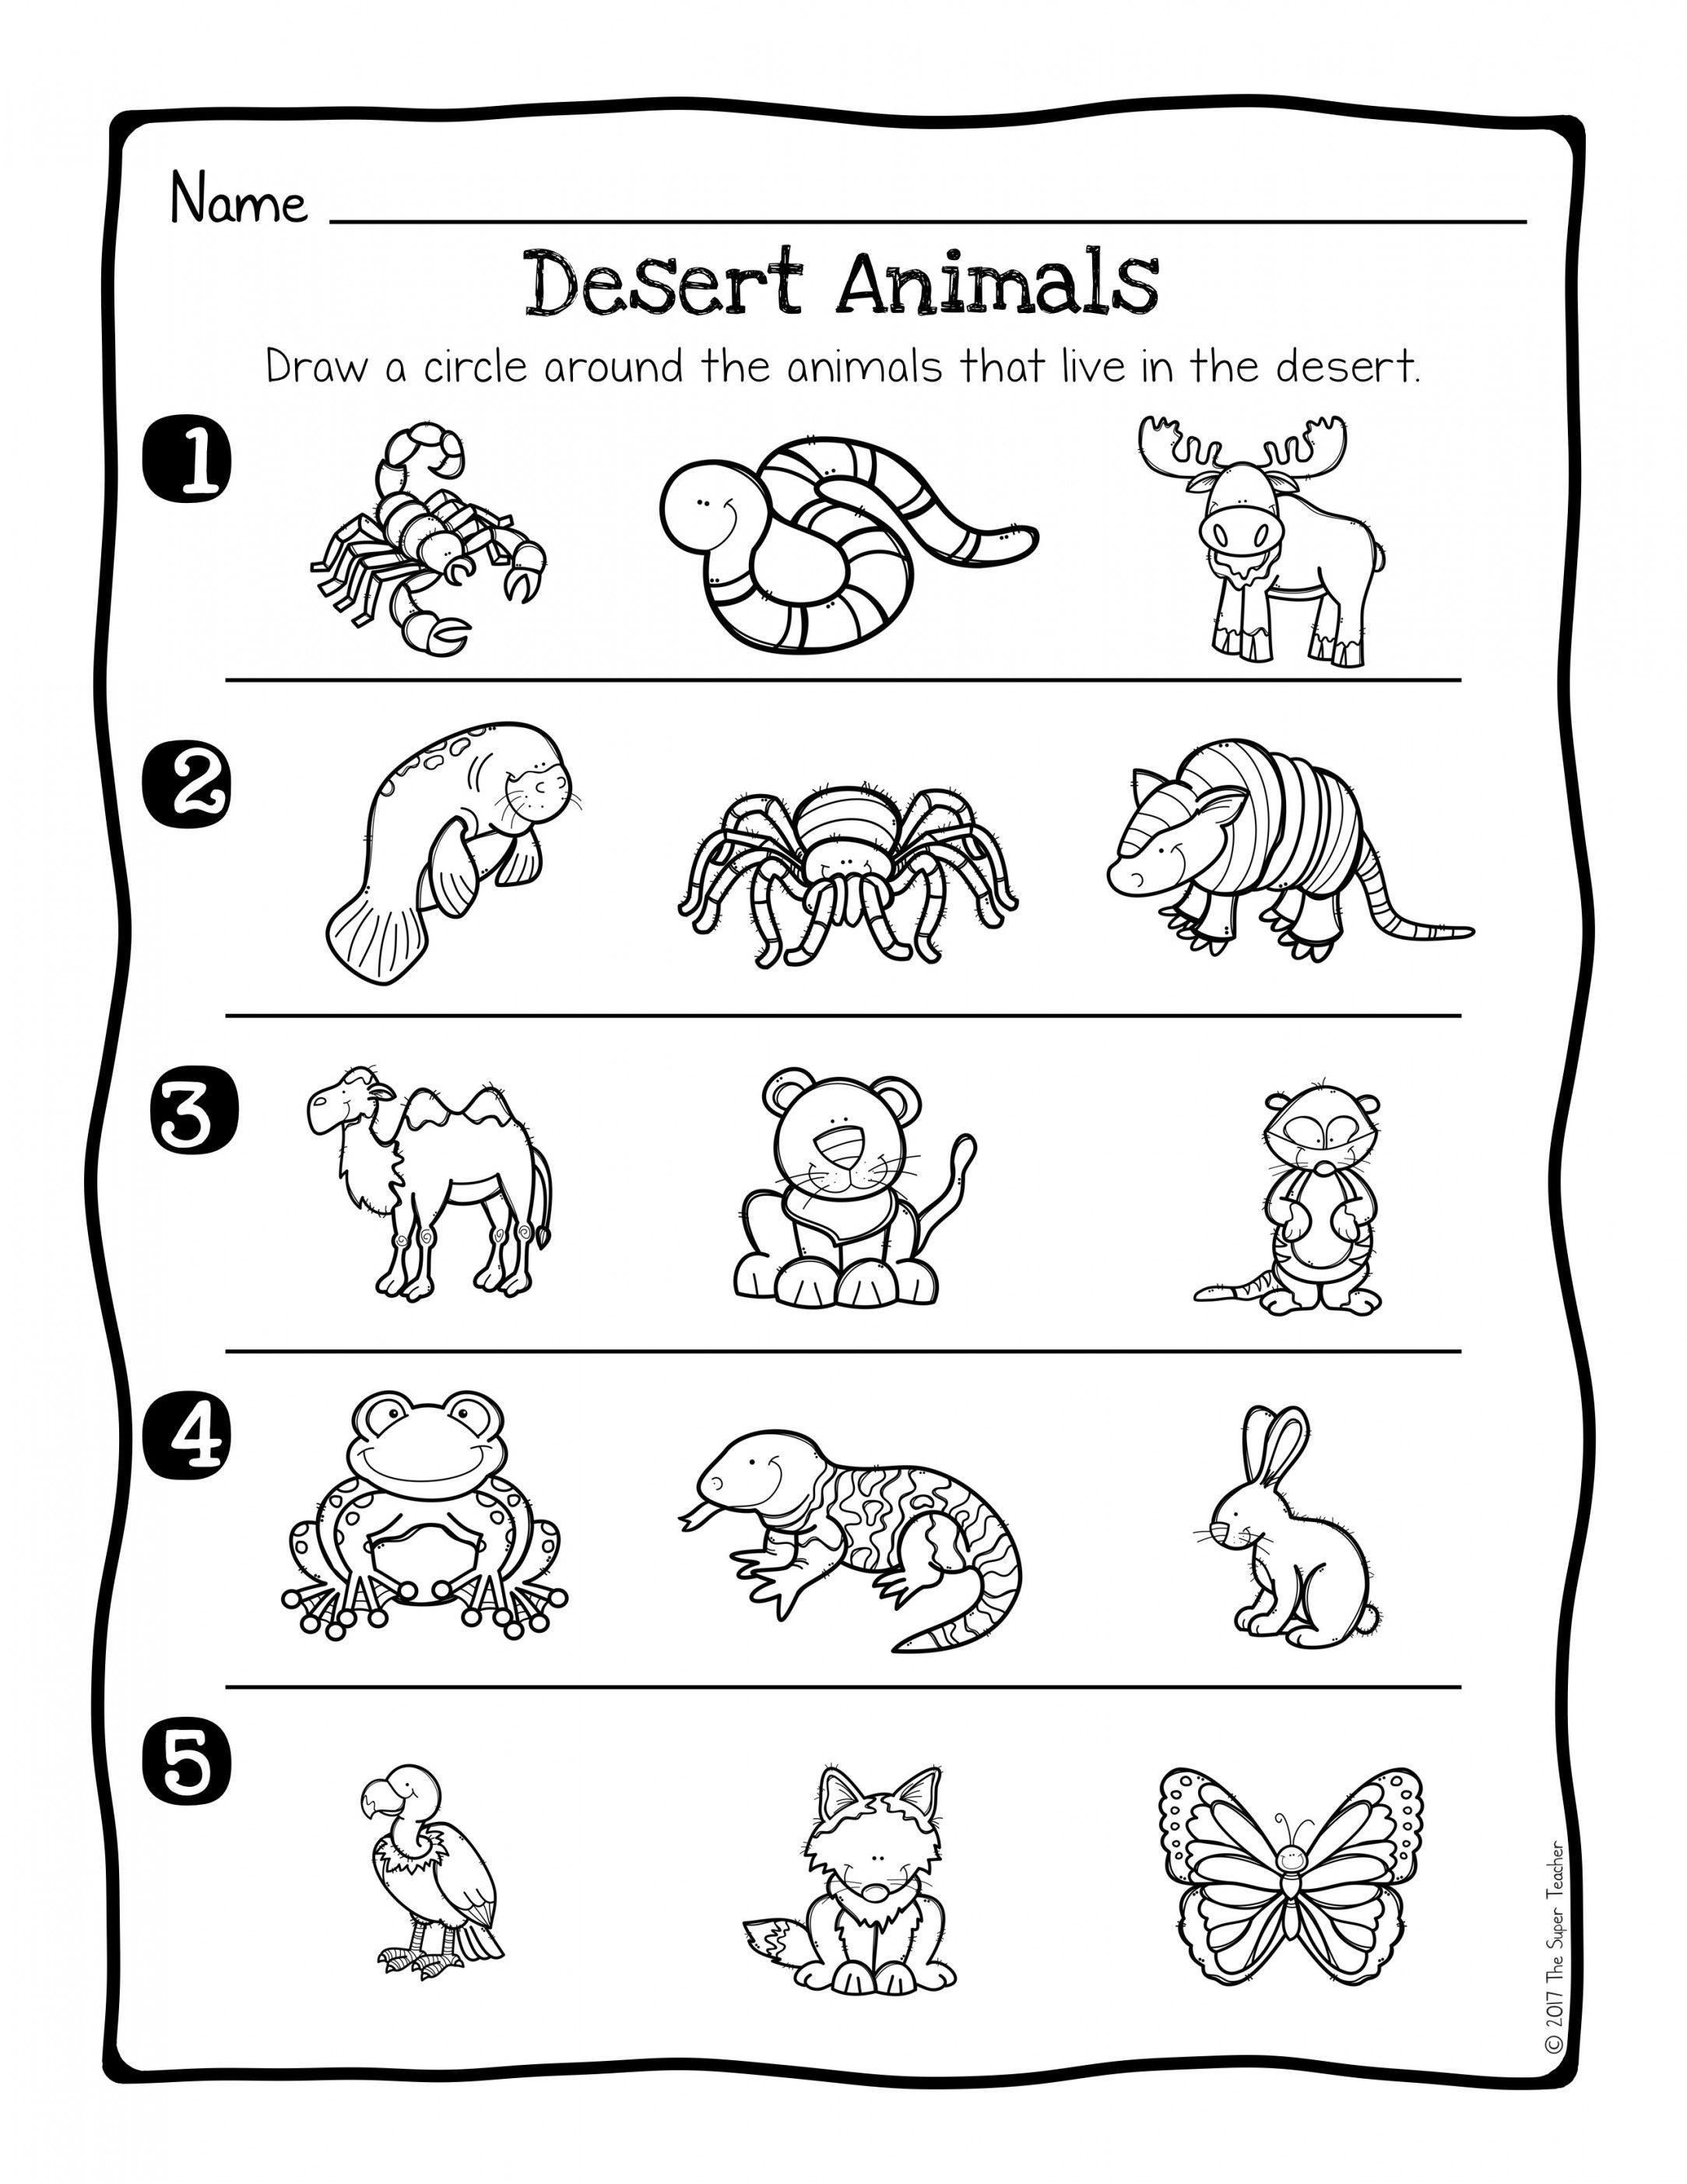 Animal Habitats Worksheets | Lostranquillos - Free Printable Worksheets Animal Habitats